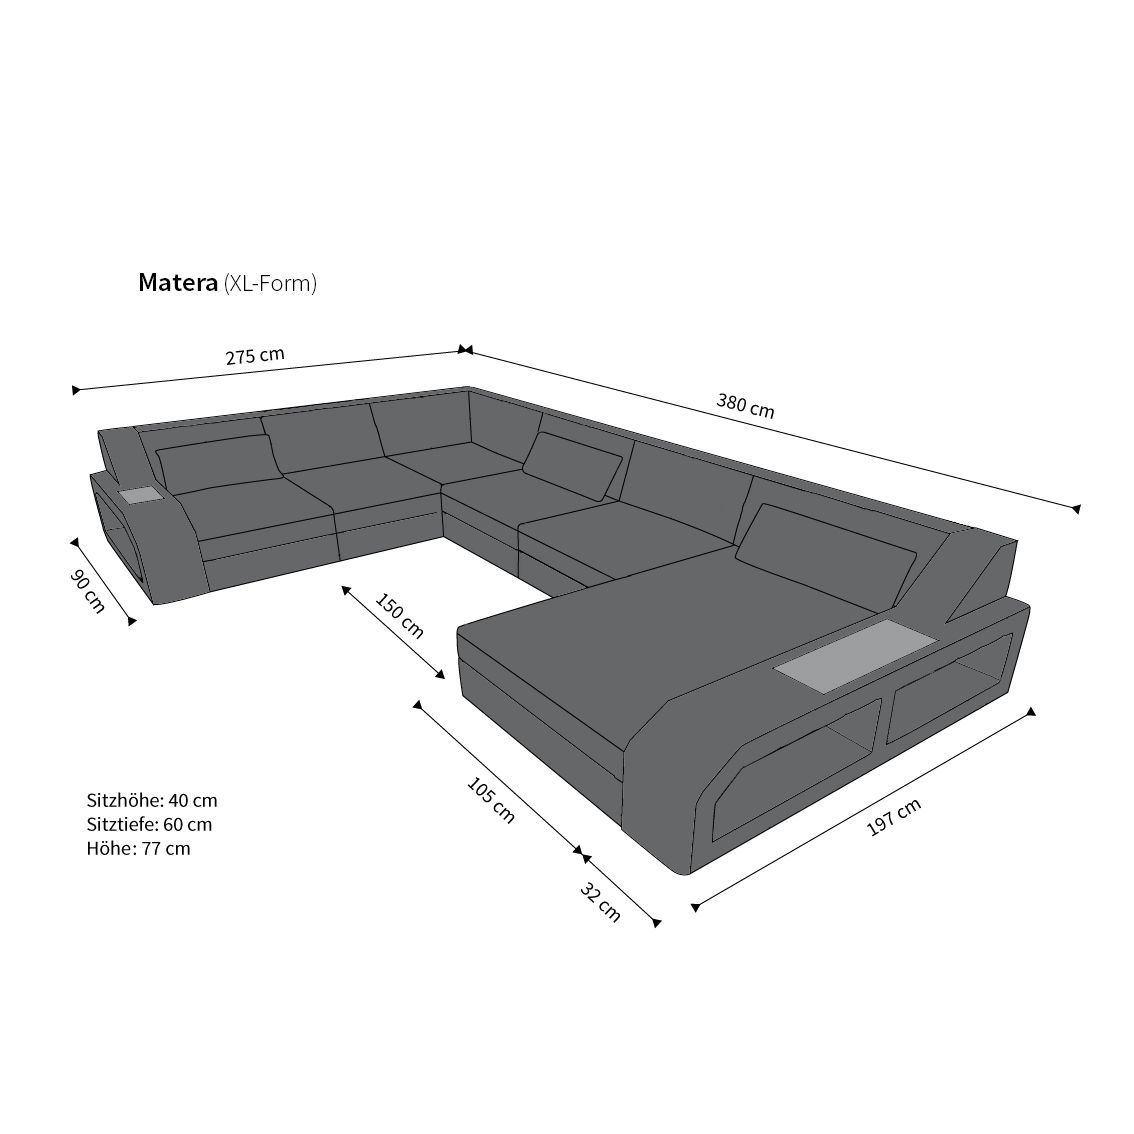 Couch u form maße  Rattan Sofa Matera U mit LED Belleuchtung